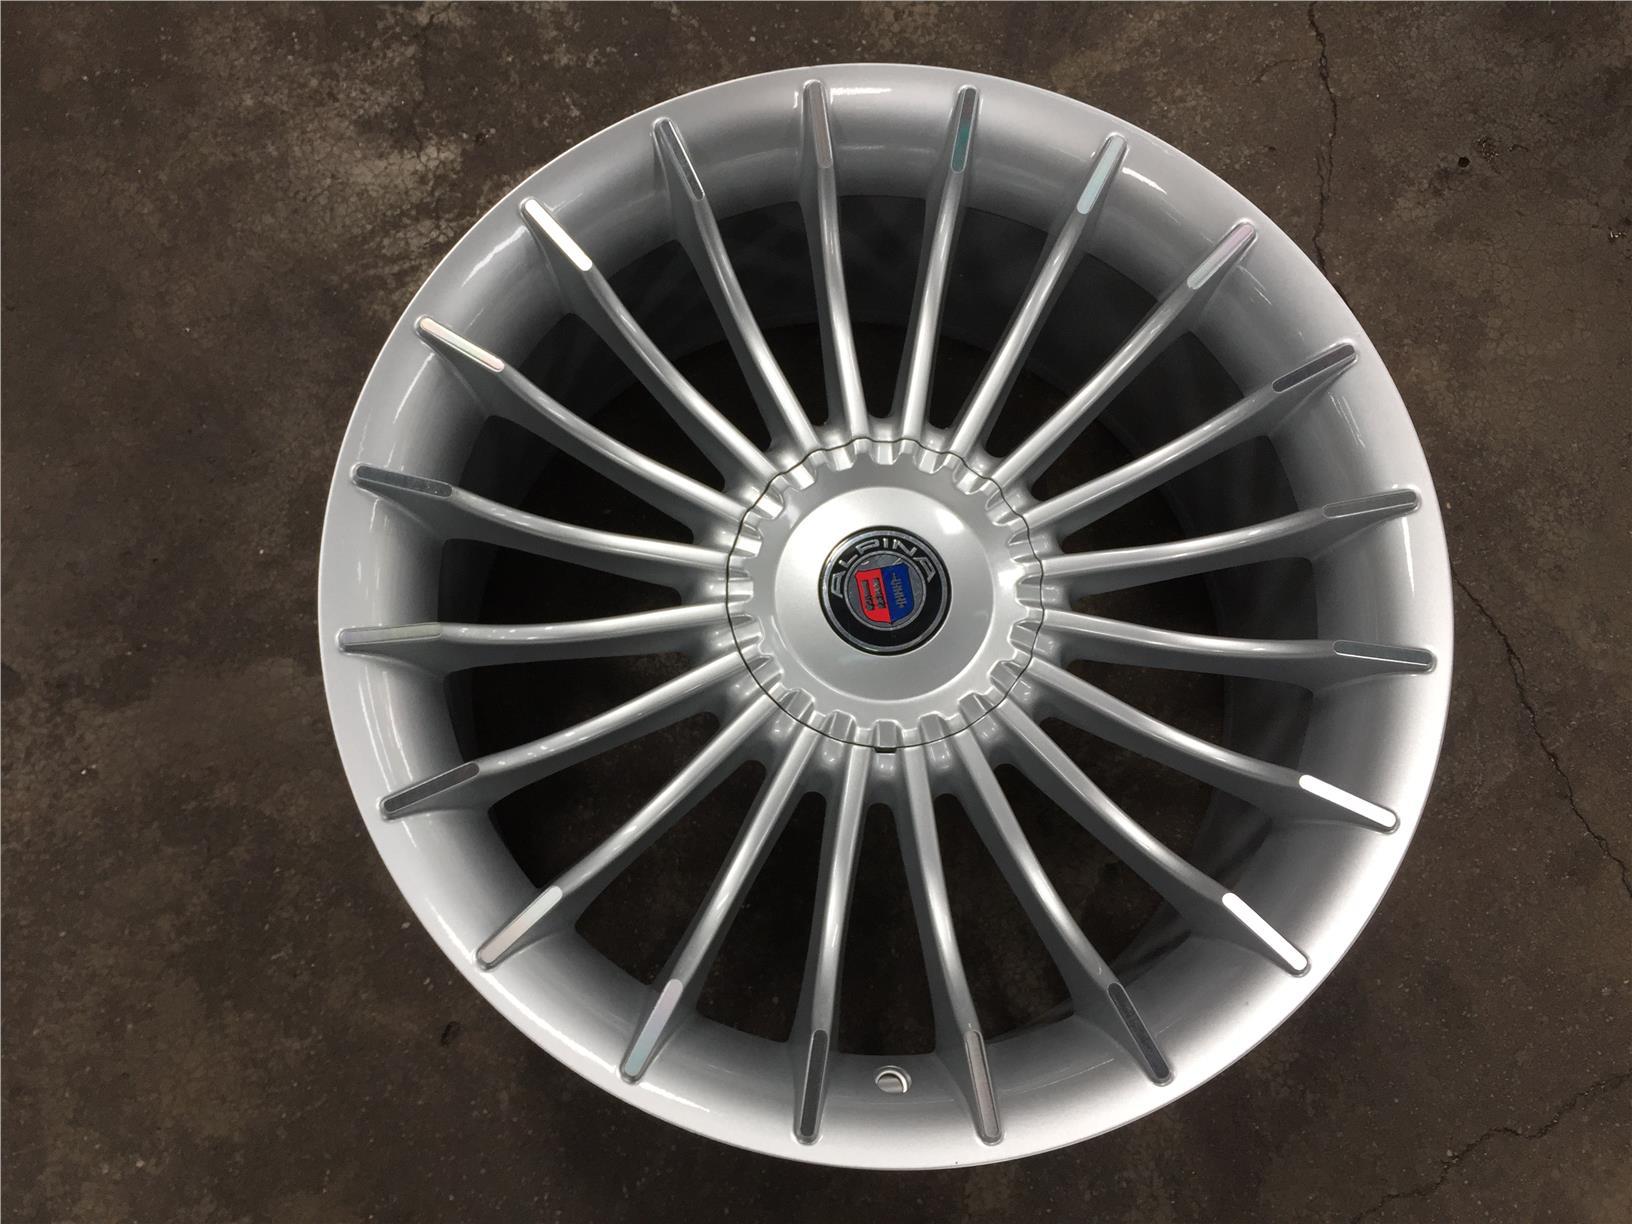 New Inch Staggered Alpina B Desig End AM - Alpina b7 wheels for sale